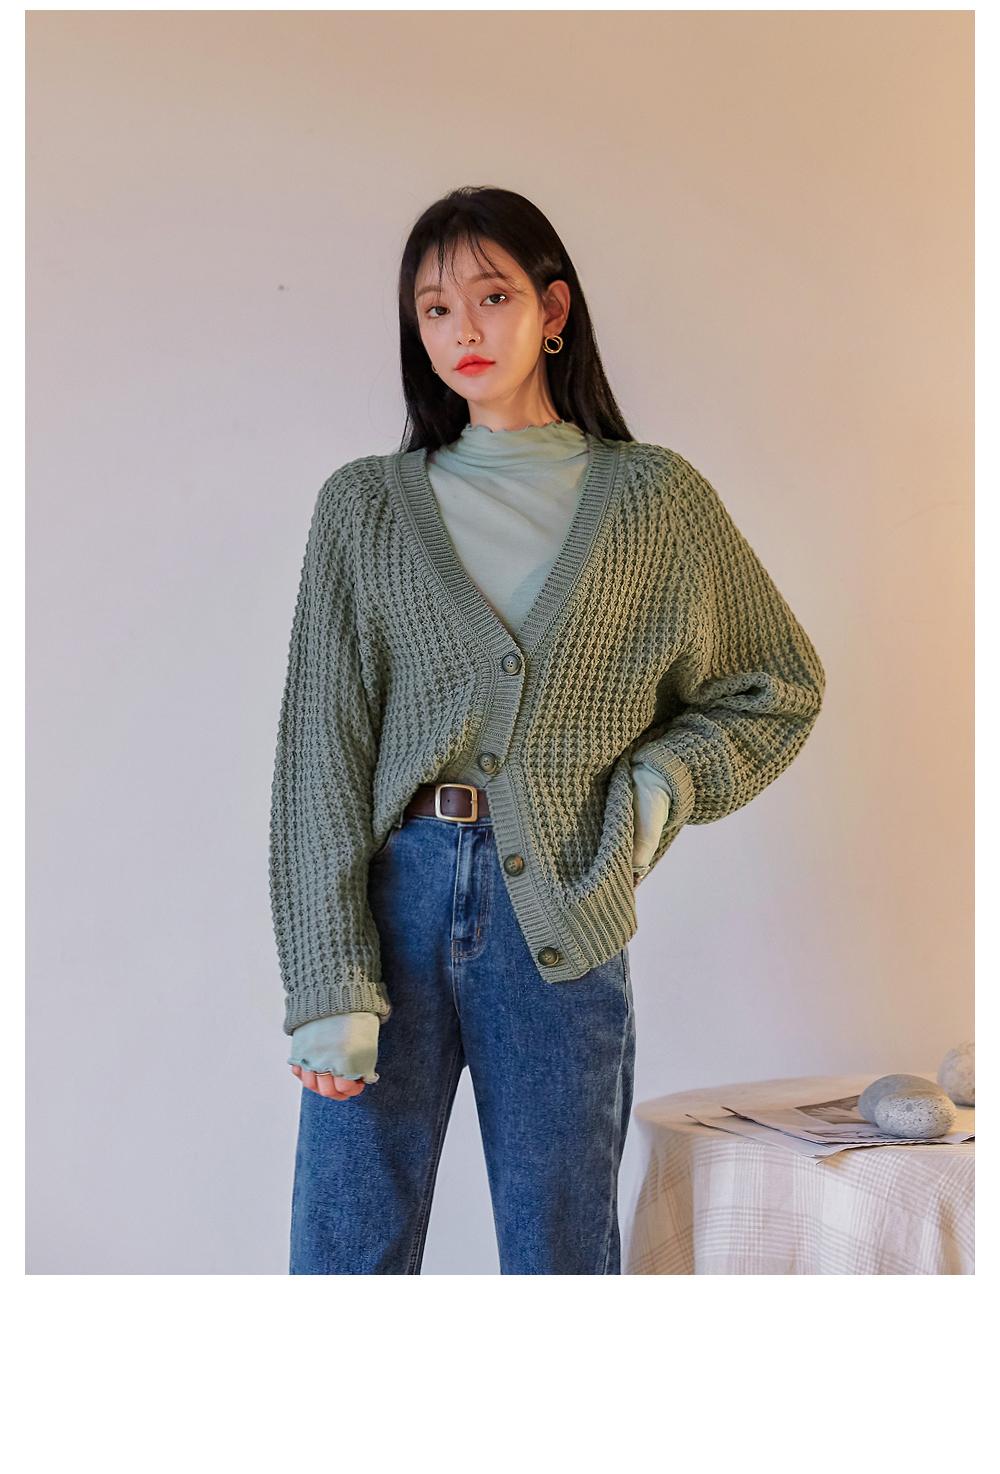 dress model image-S1L22